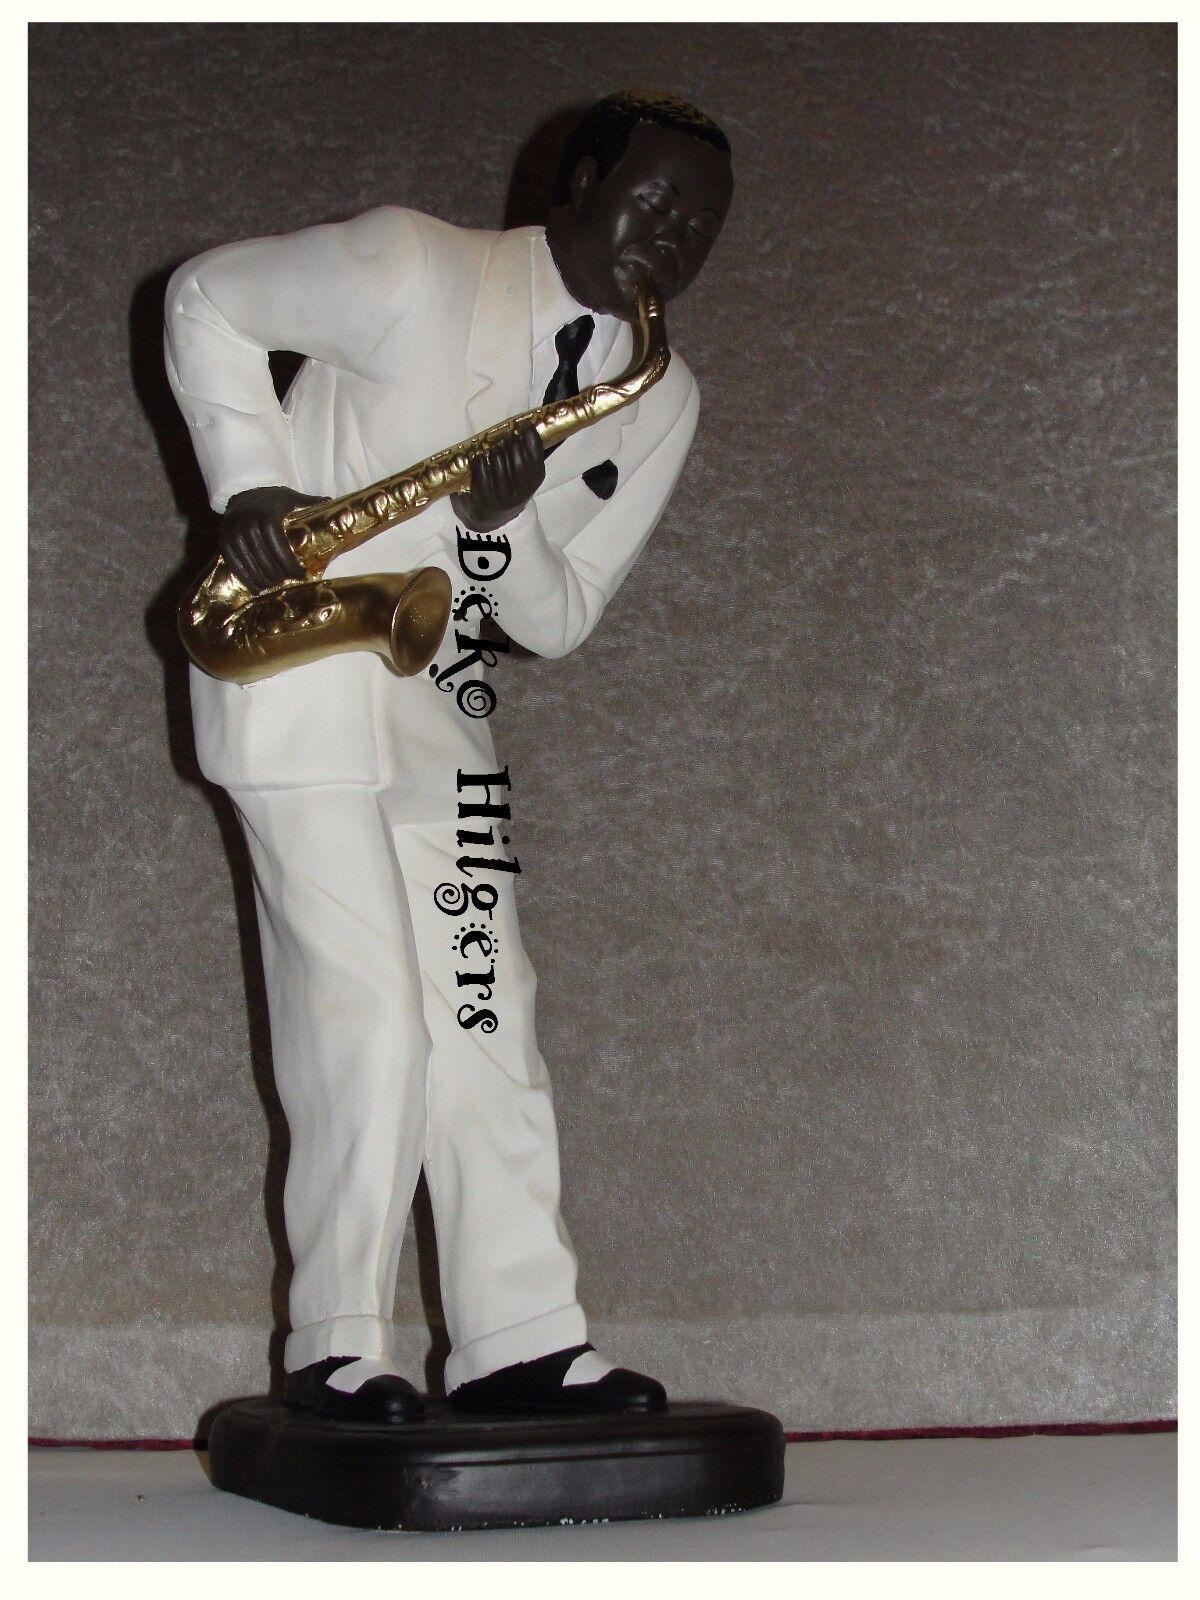 Saxophon Figur Jazz Musiker Skulptur Jazzfigur Afrika Musik Werbefigur Deko 01